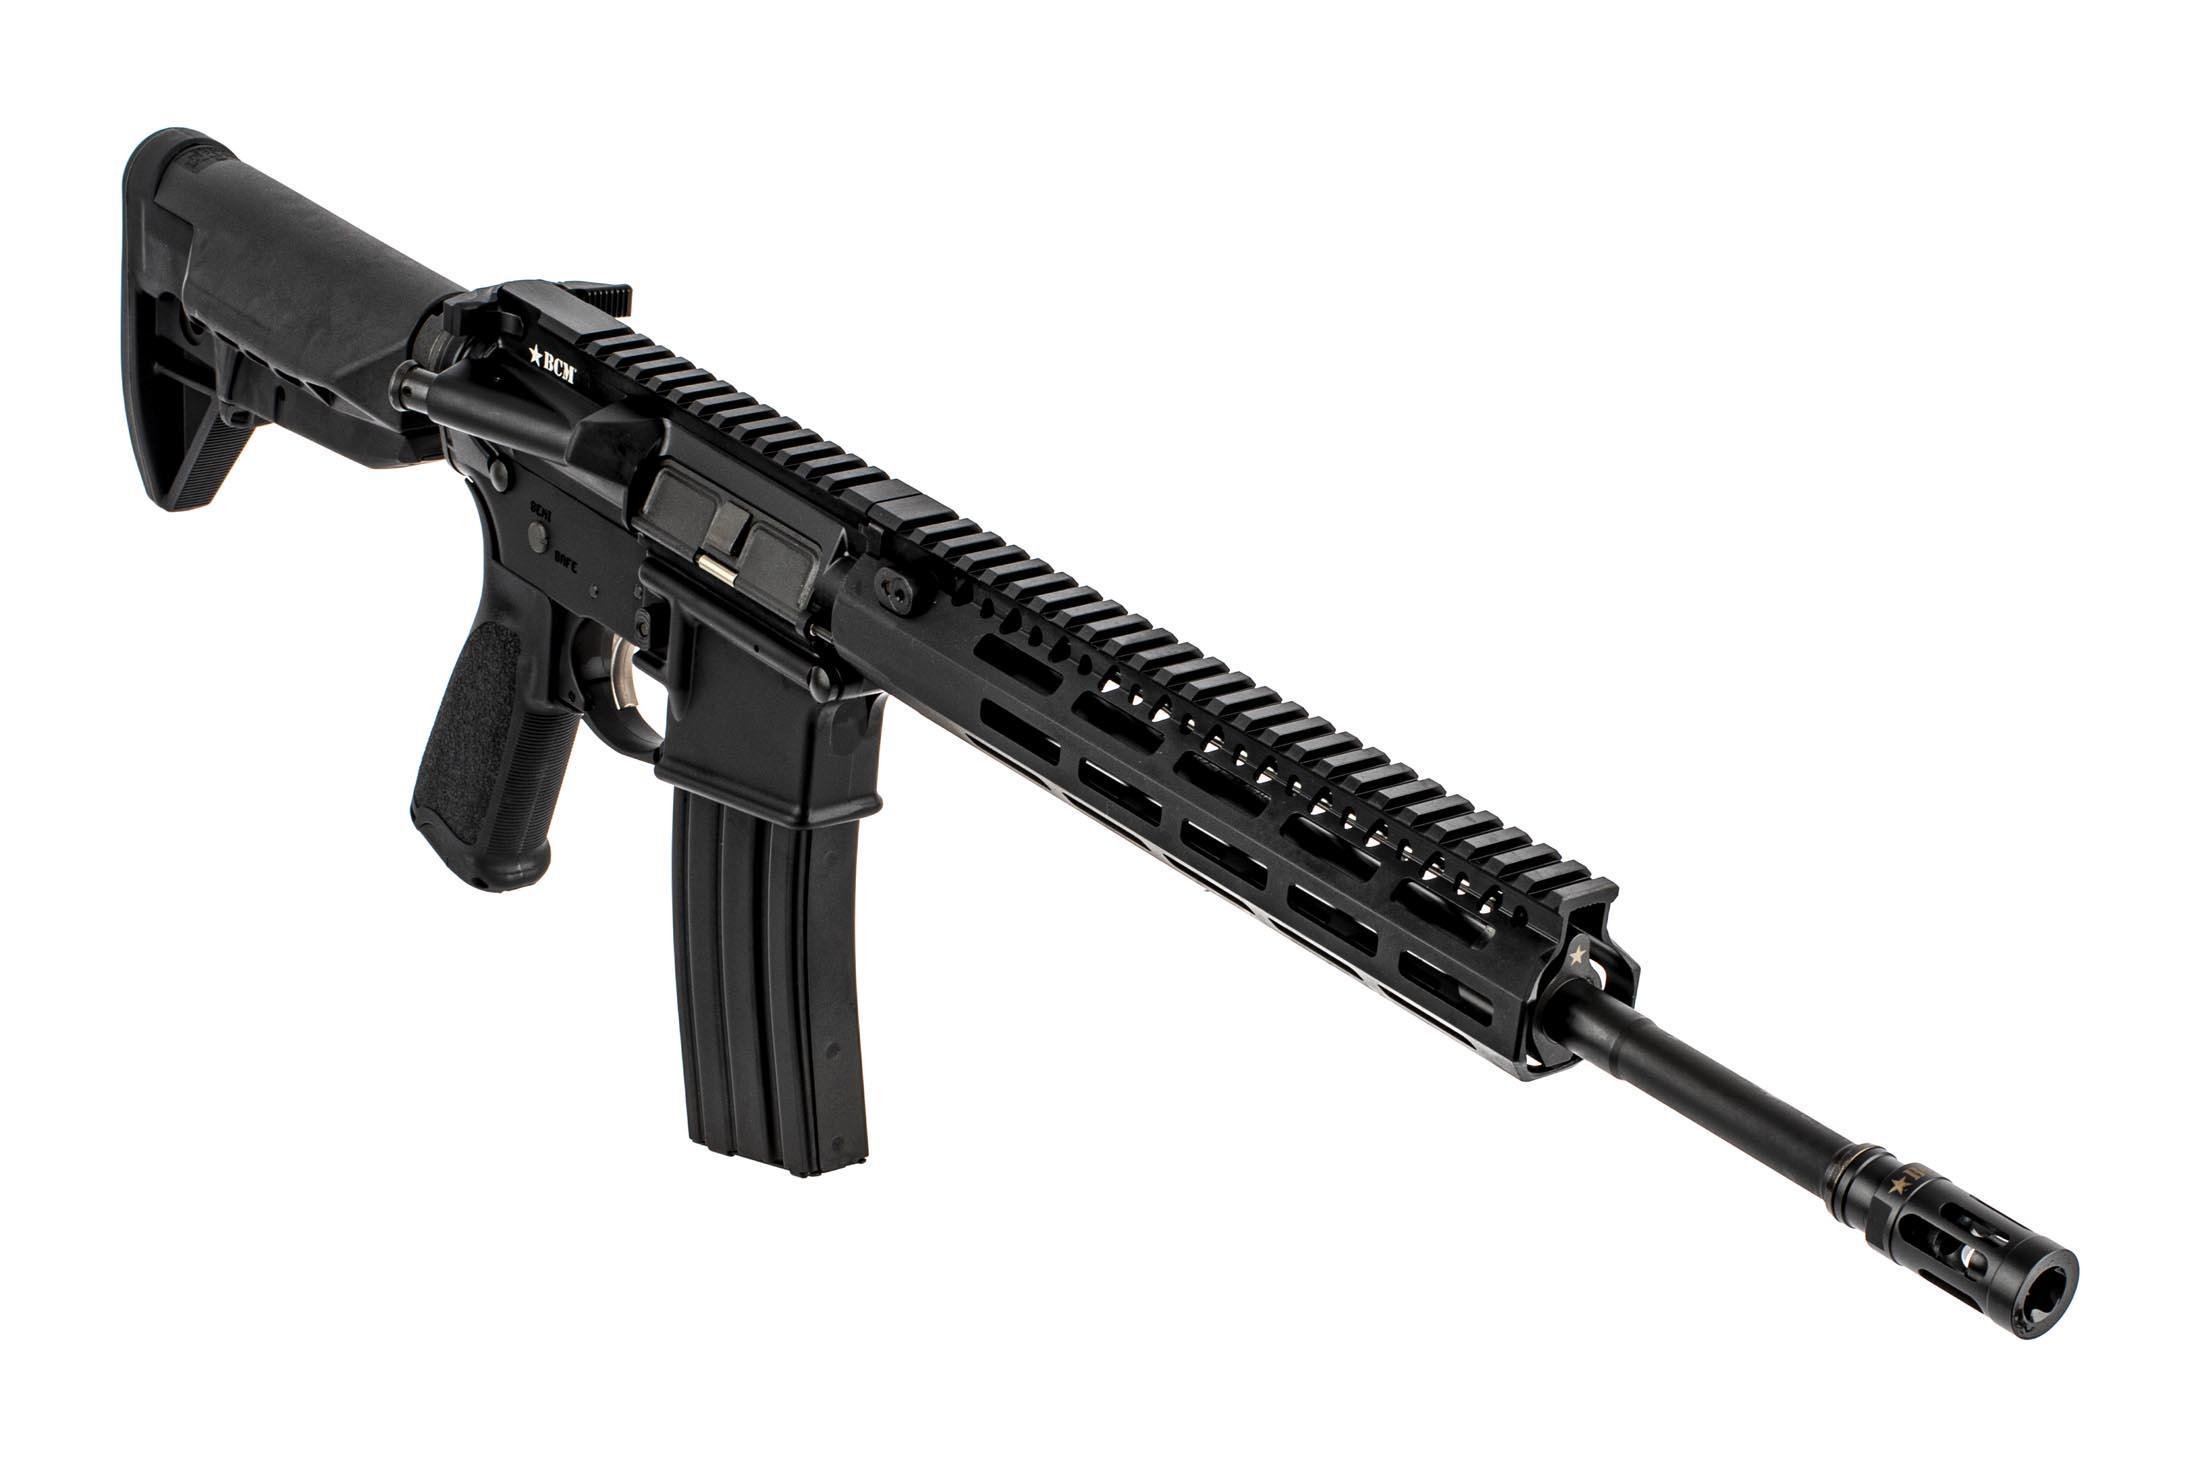 Bravo Company Manufacturing RECCE-14 MCMR Lightweight 5.56 Rifle